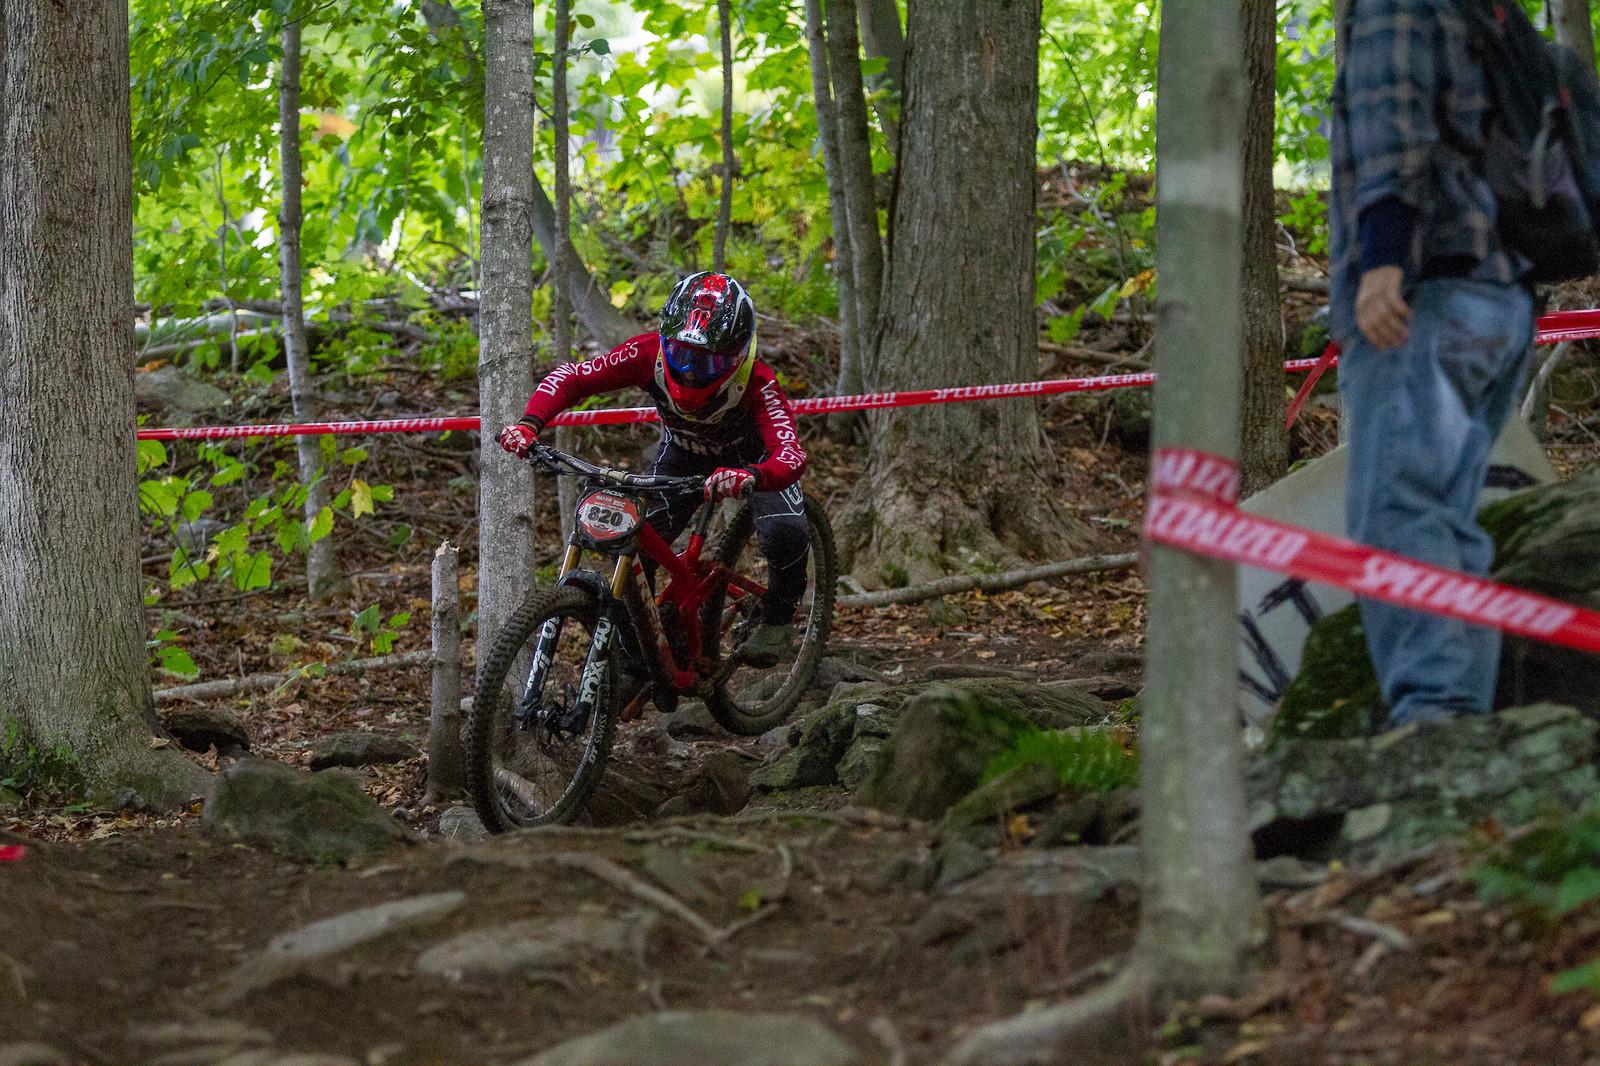 Michael Maldonado - JackRice - Mountain Biking Pictures - Vital MTB